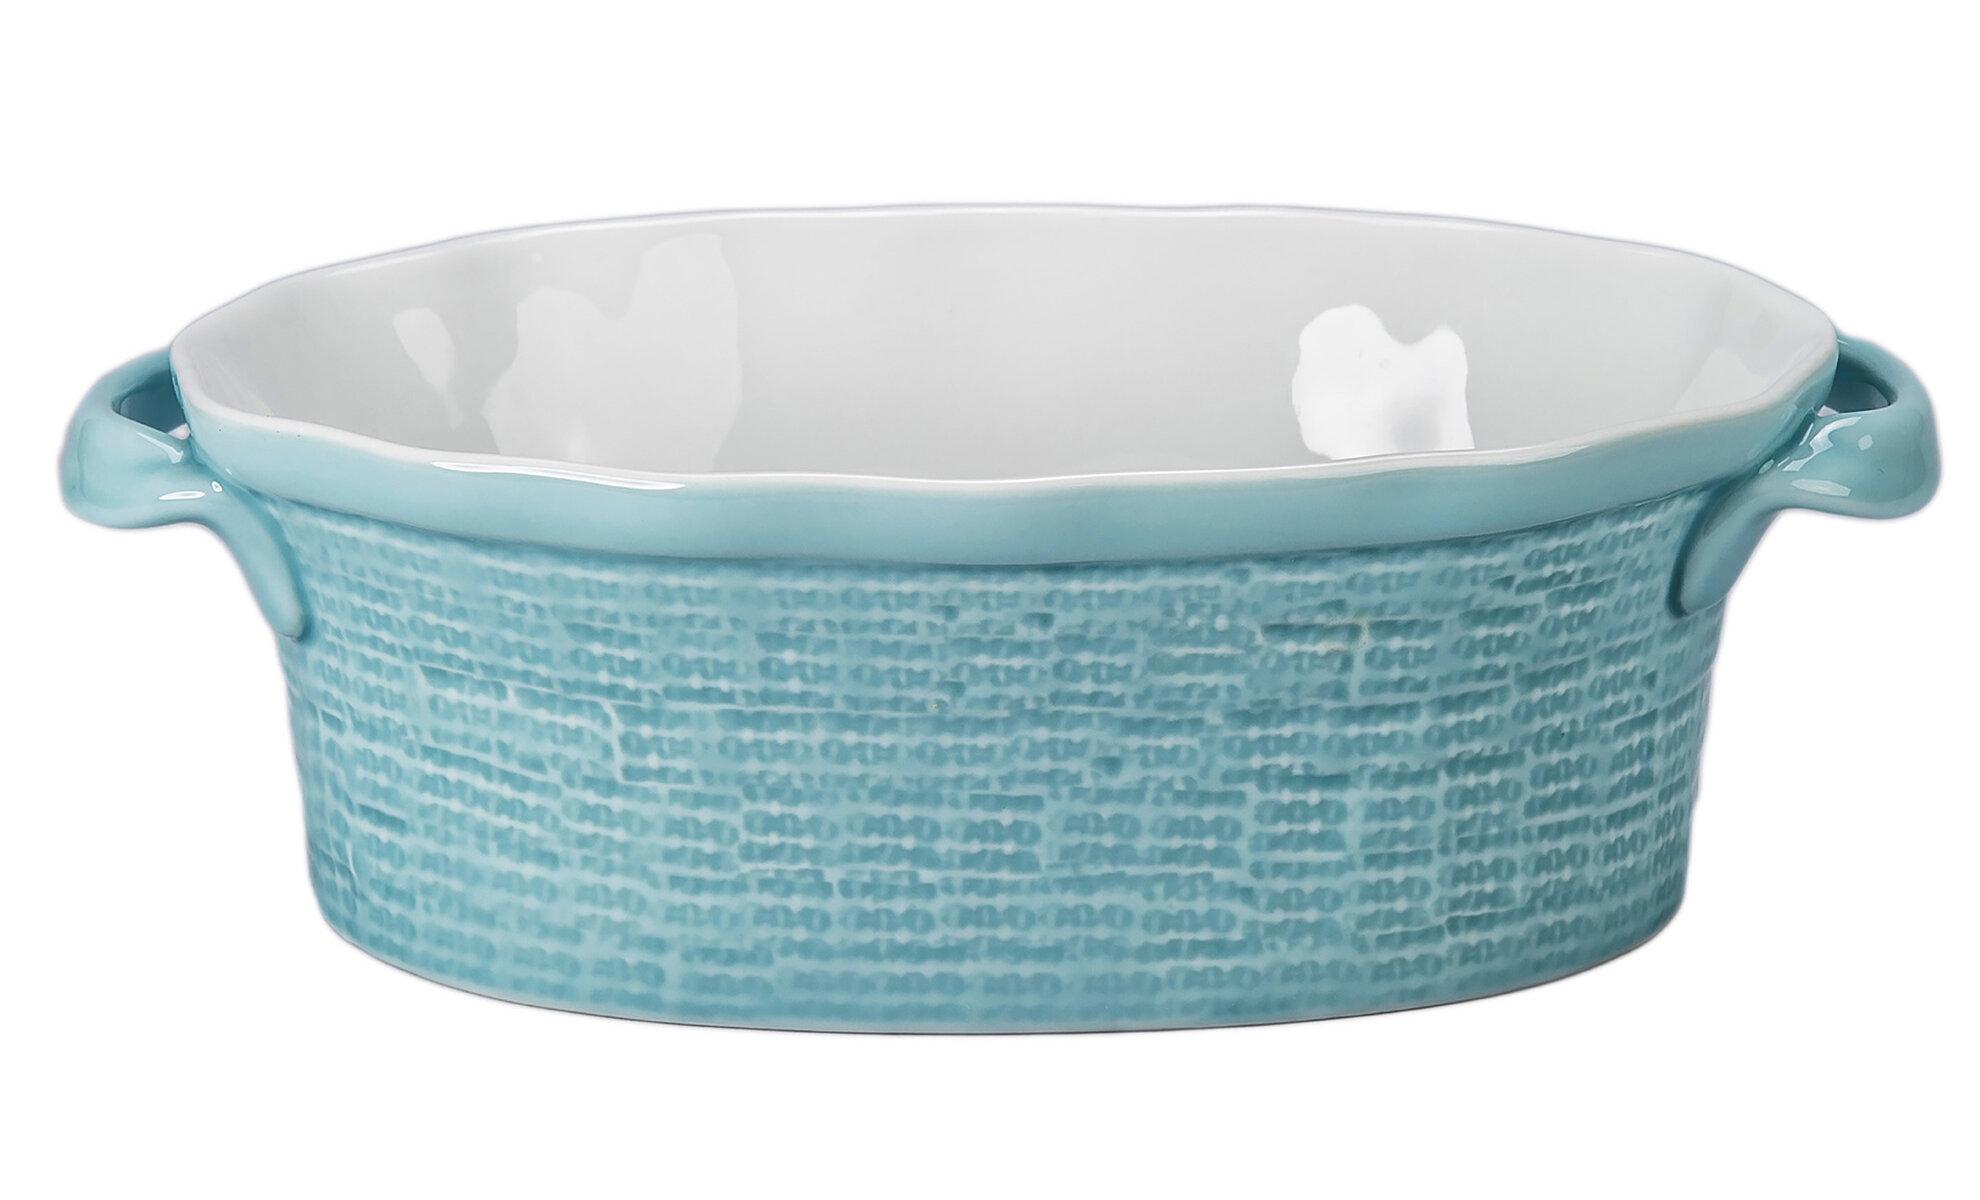 Bia Cordon Bleu Isabel 1 5 Qt Ceramic Oval Deep Baker With Handles Wayfair